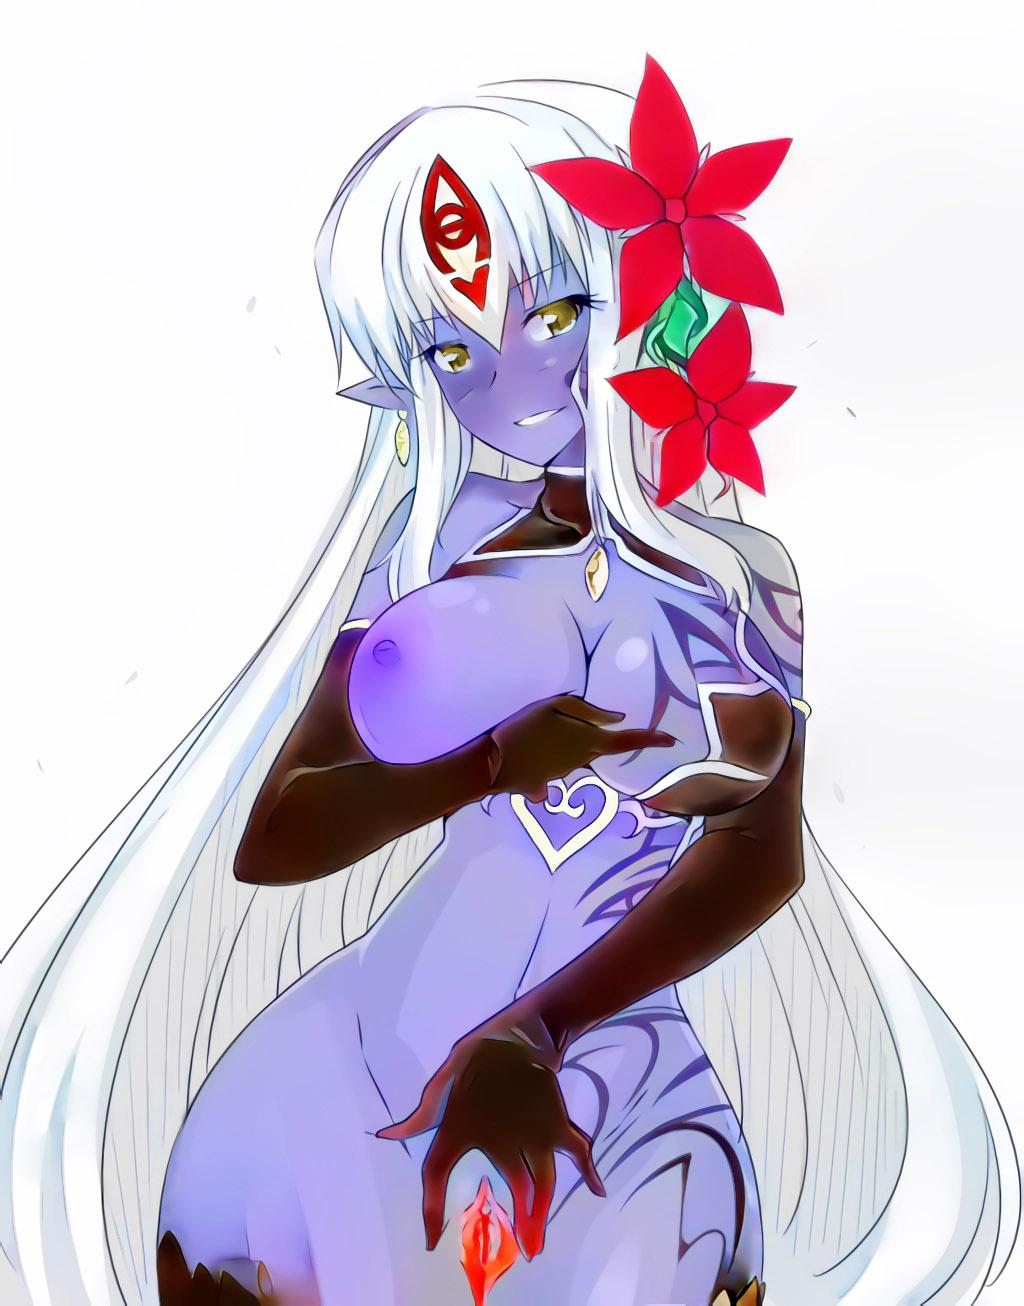 monster girl quest vampire girl My_hero_academia